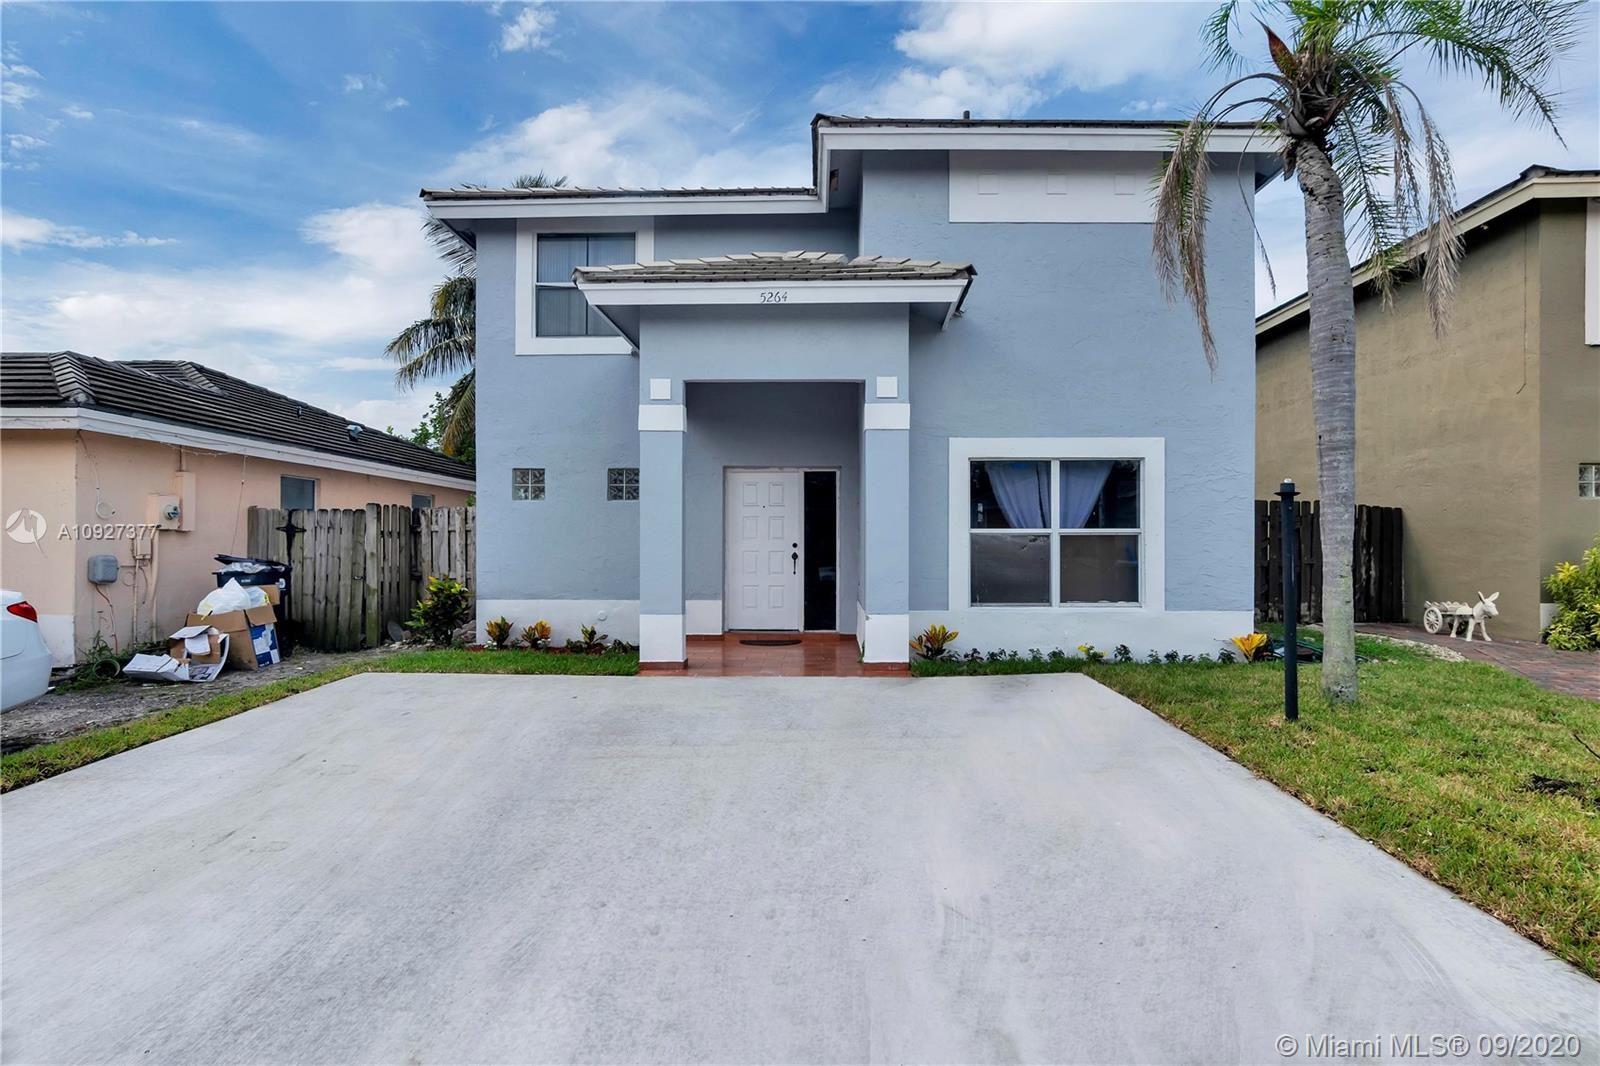 5264 NW 186th St, Miami Gardens, FL 33055 - #: A10927377